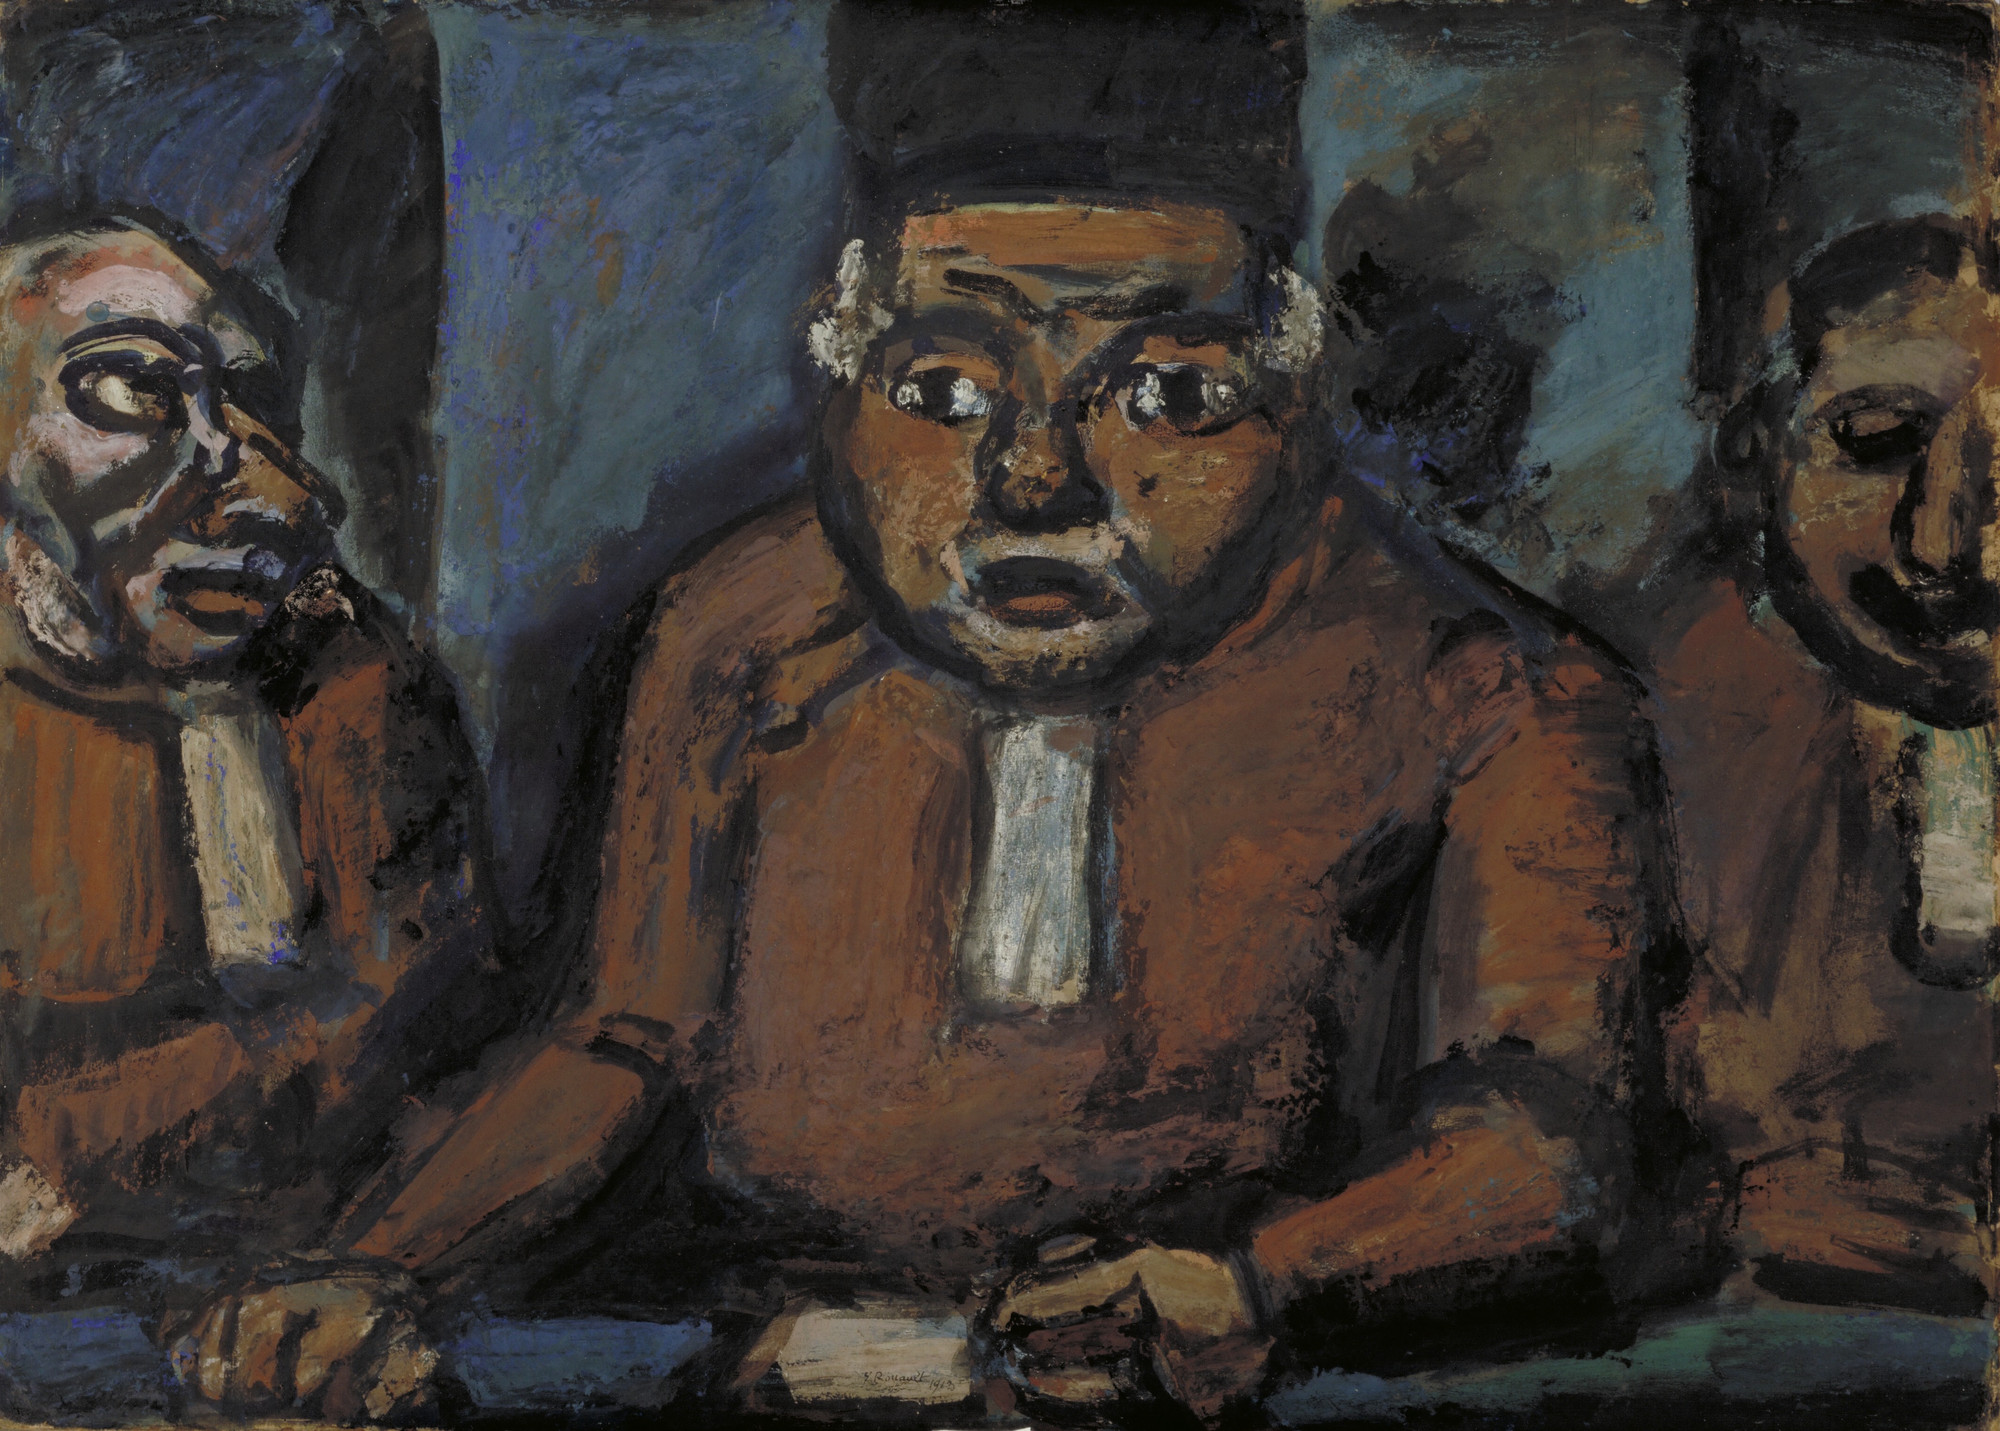 Georges Rouault  The Three Judges  1913 | MoMA